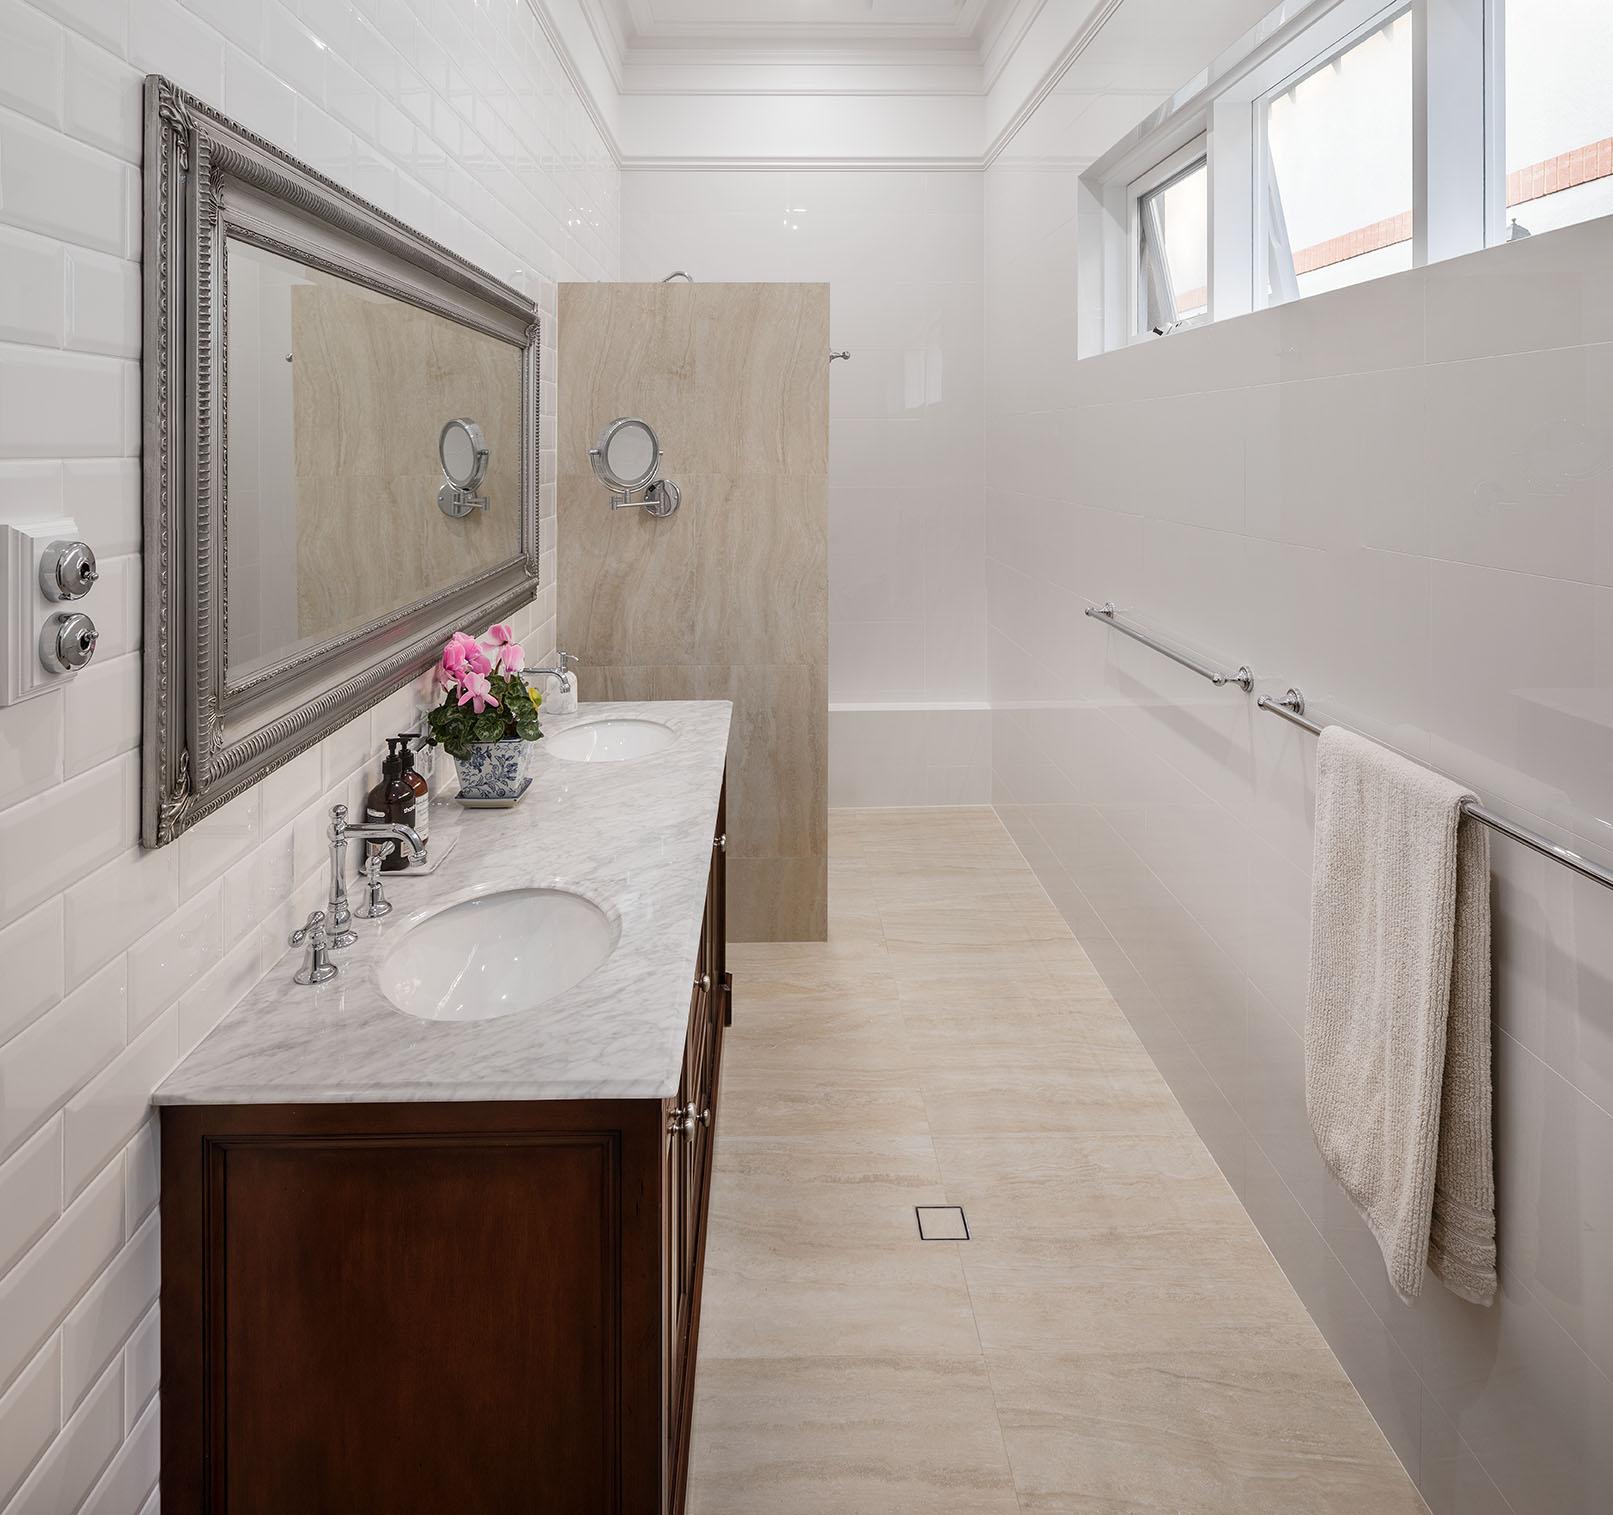 clive_bathroom_01.jpg